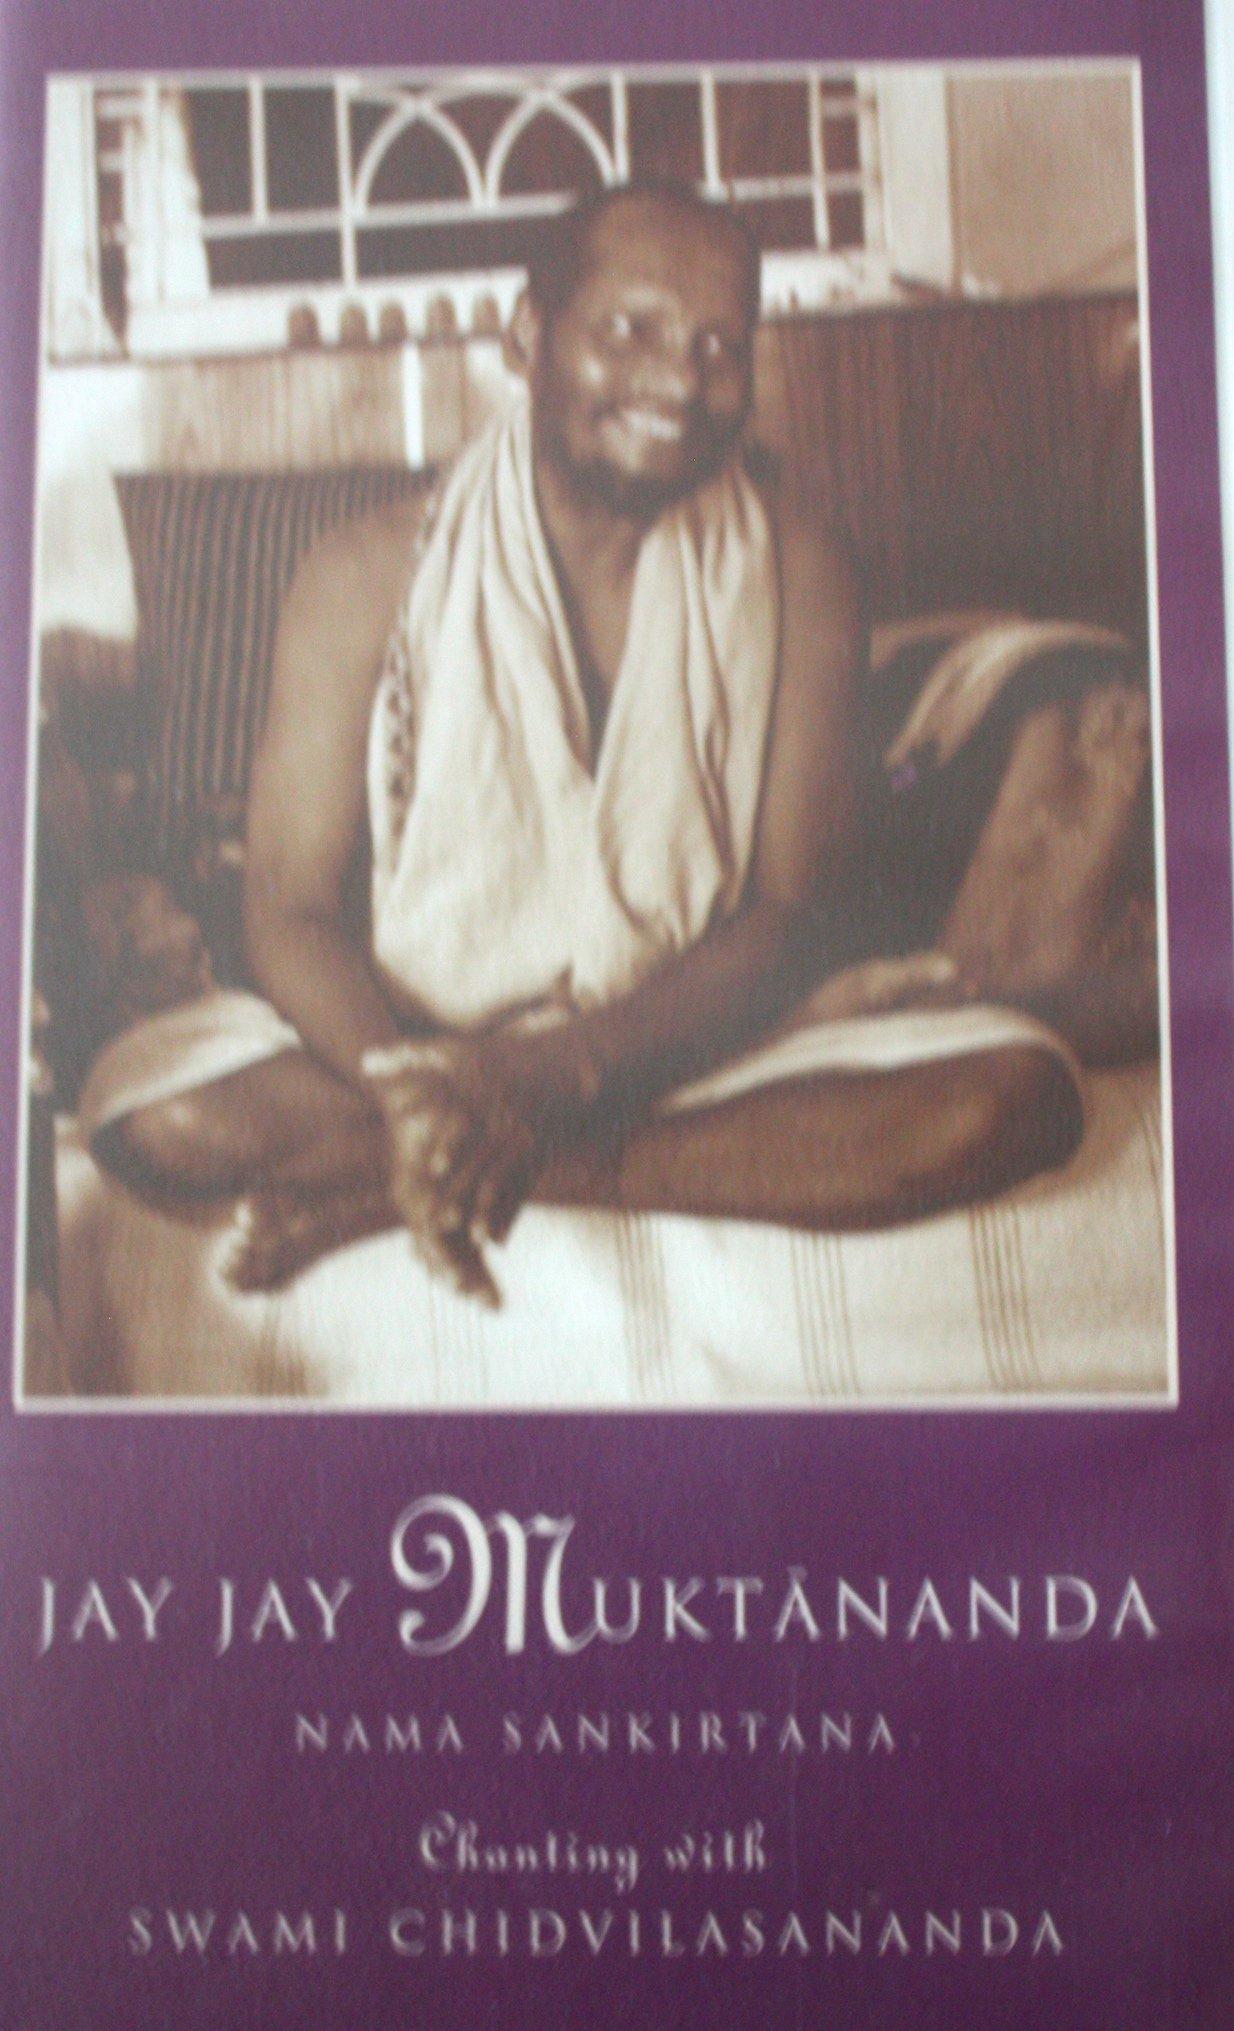 Vhs Jay Jay Muktananda Chanting With Gurumayi Chidvilasananda Vhs Video Cassette Recording Jay Jay Muktananda Amazon Com Books